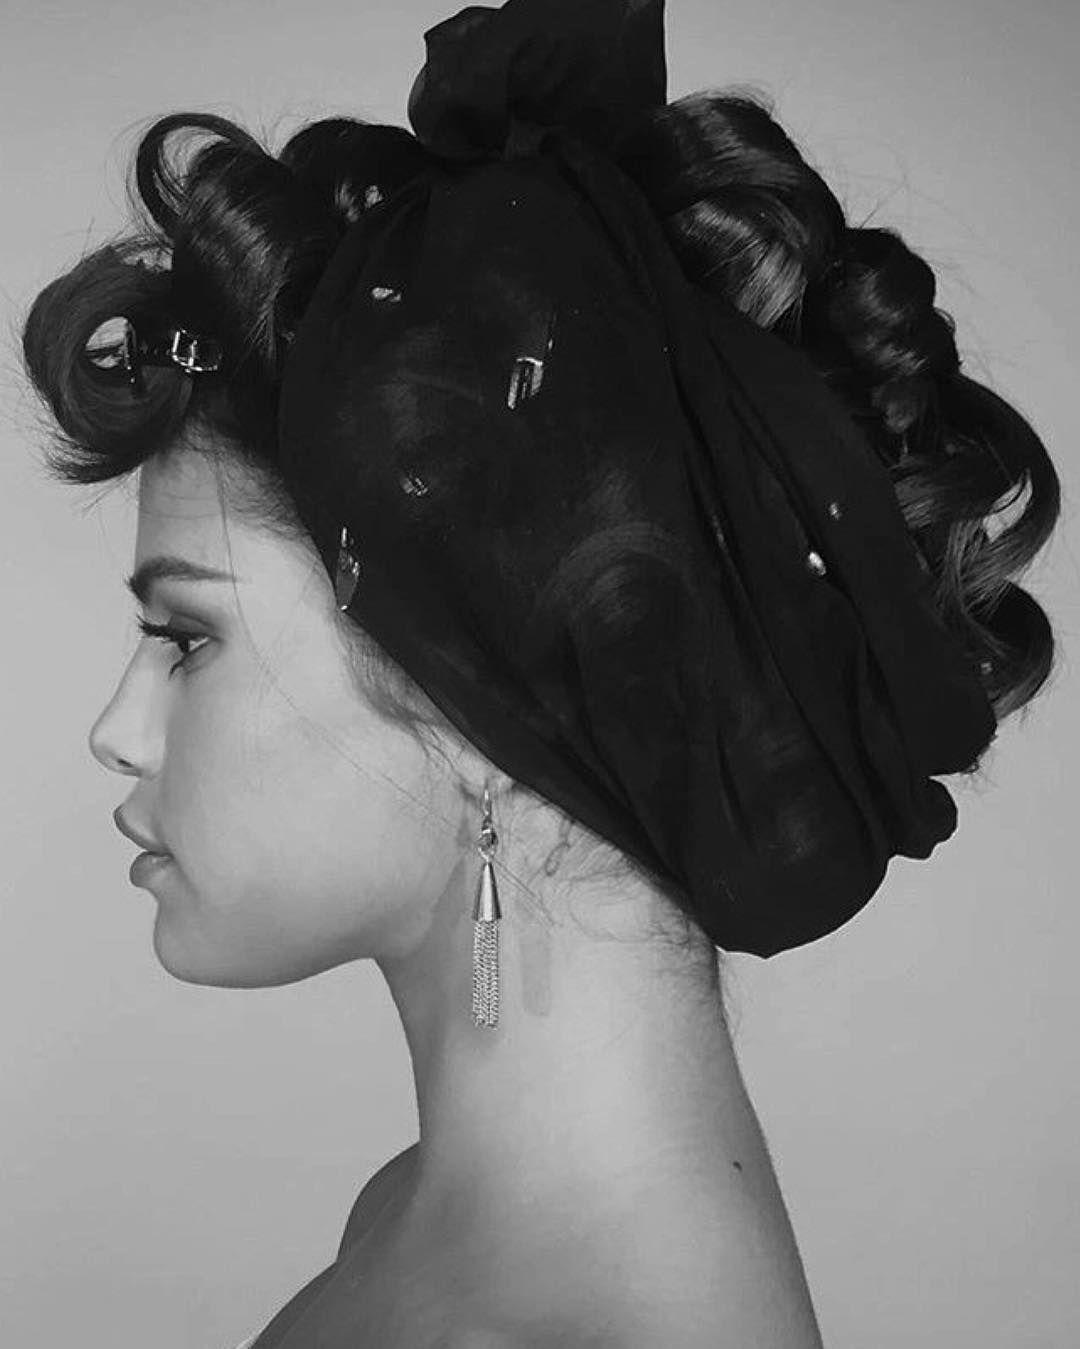 Selena Gomez News Selena Gomez Pictures Selena Gomez Selena